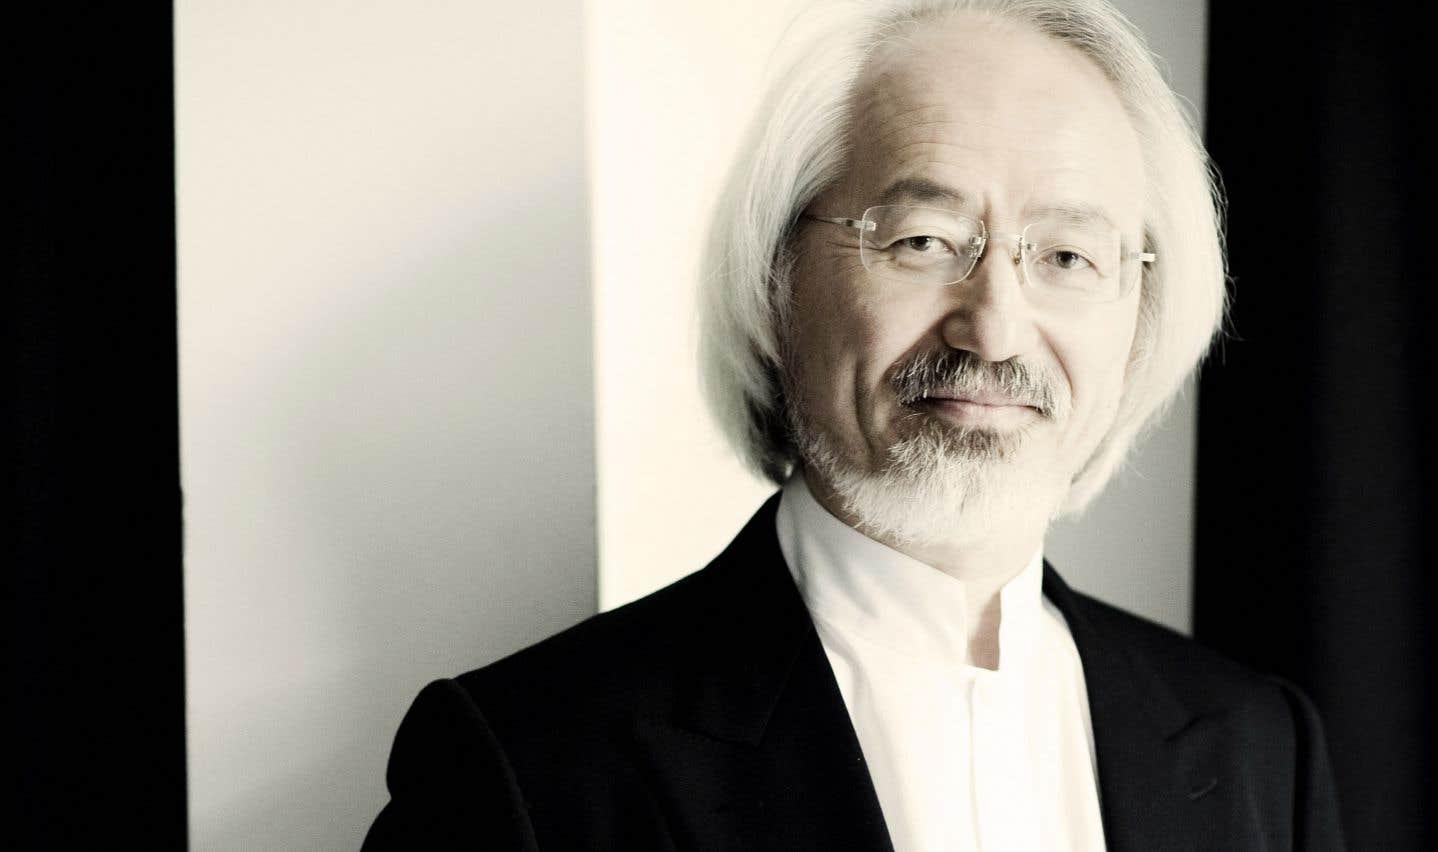 Masaaki Suzuki, fontaine de musique